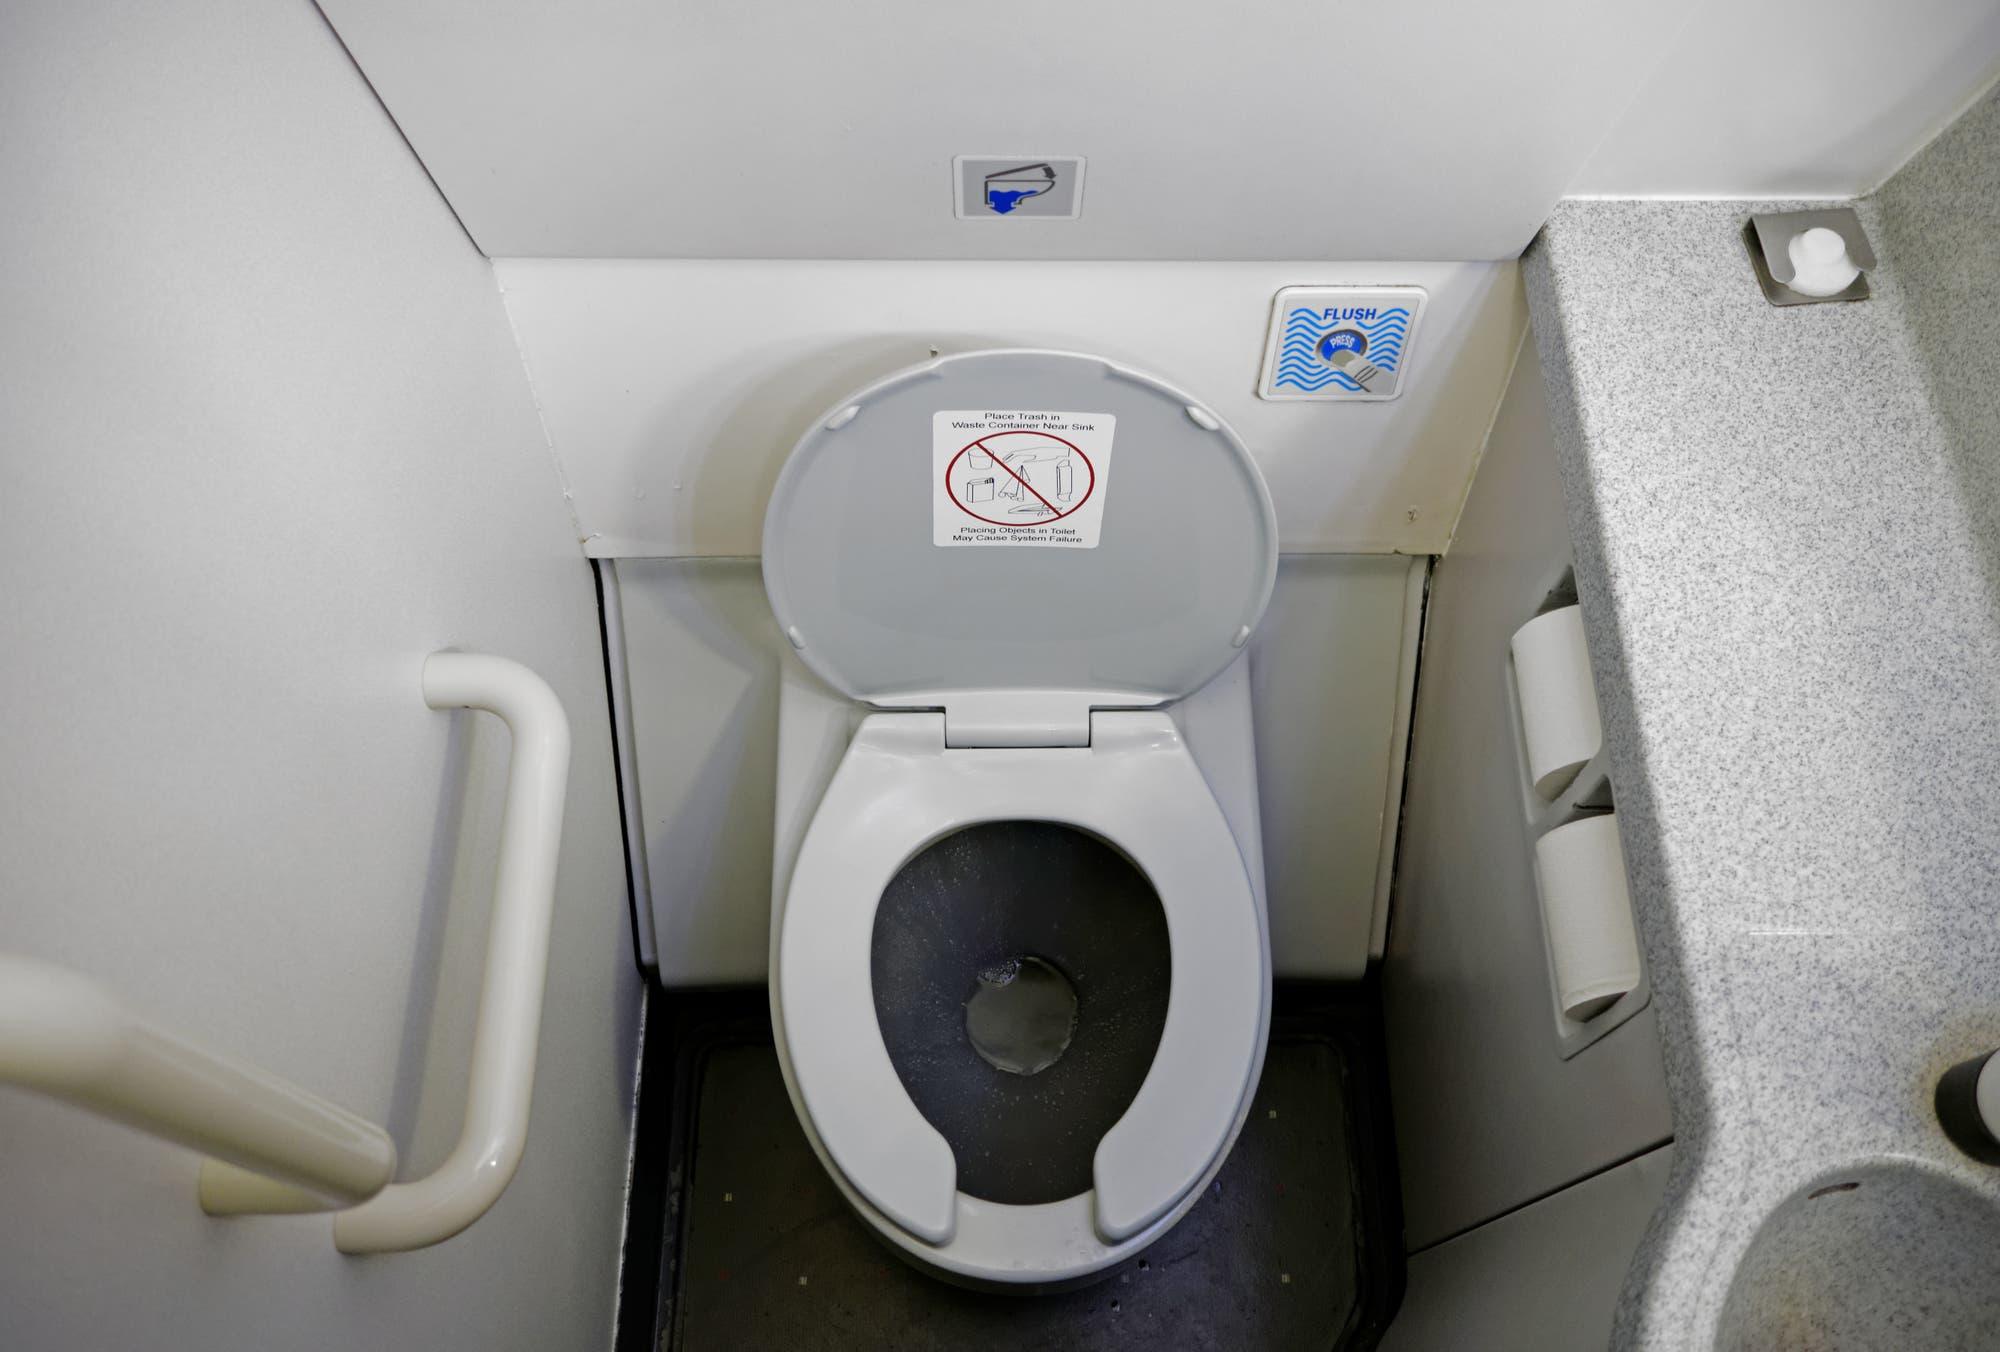 Flugzeugtoilette